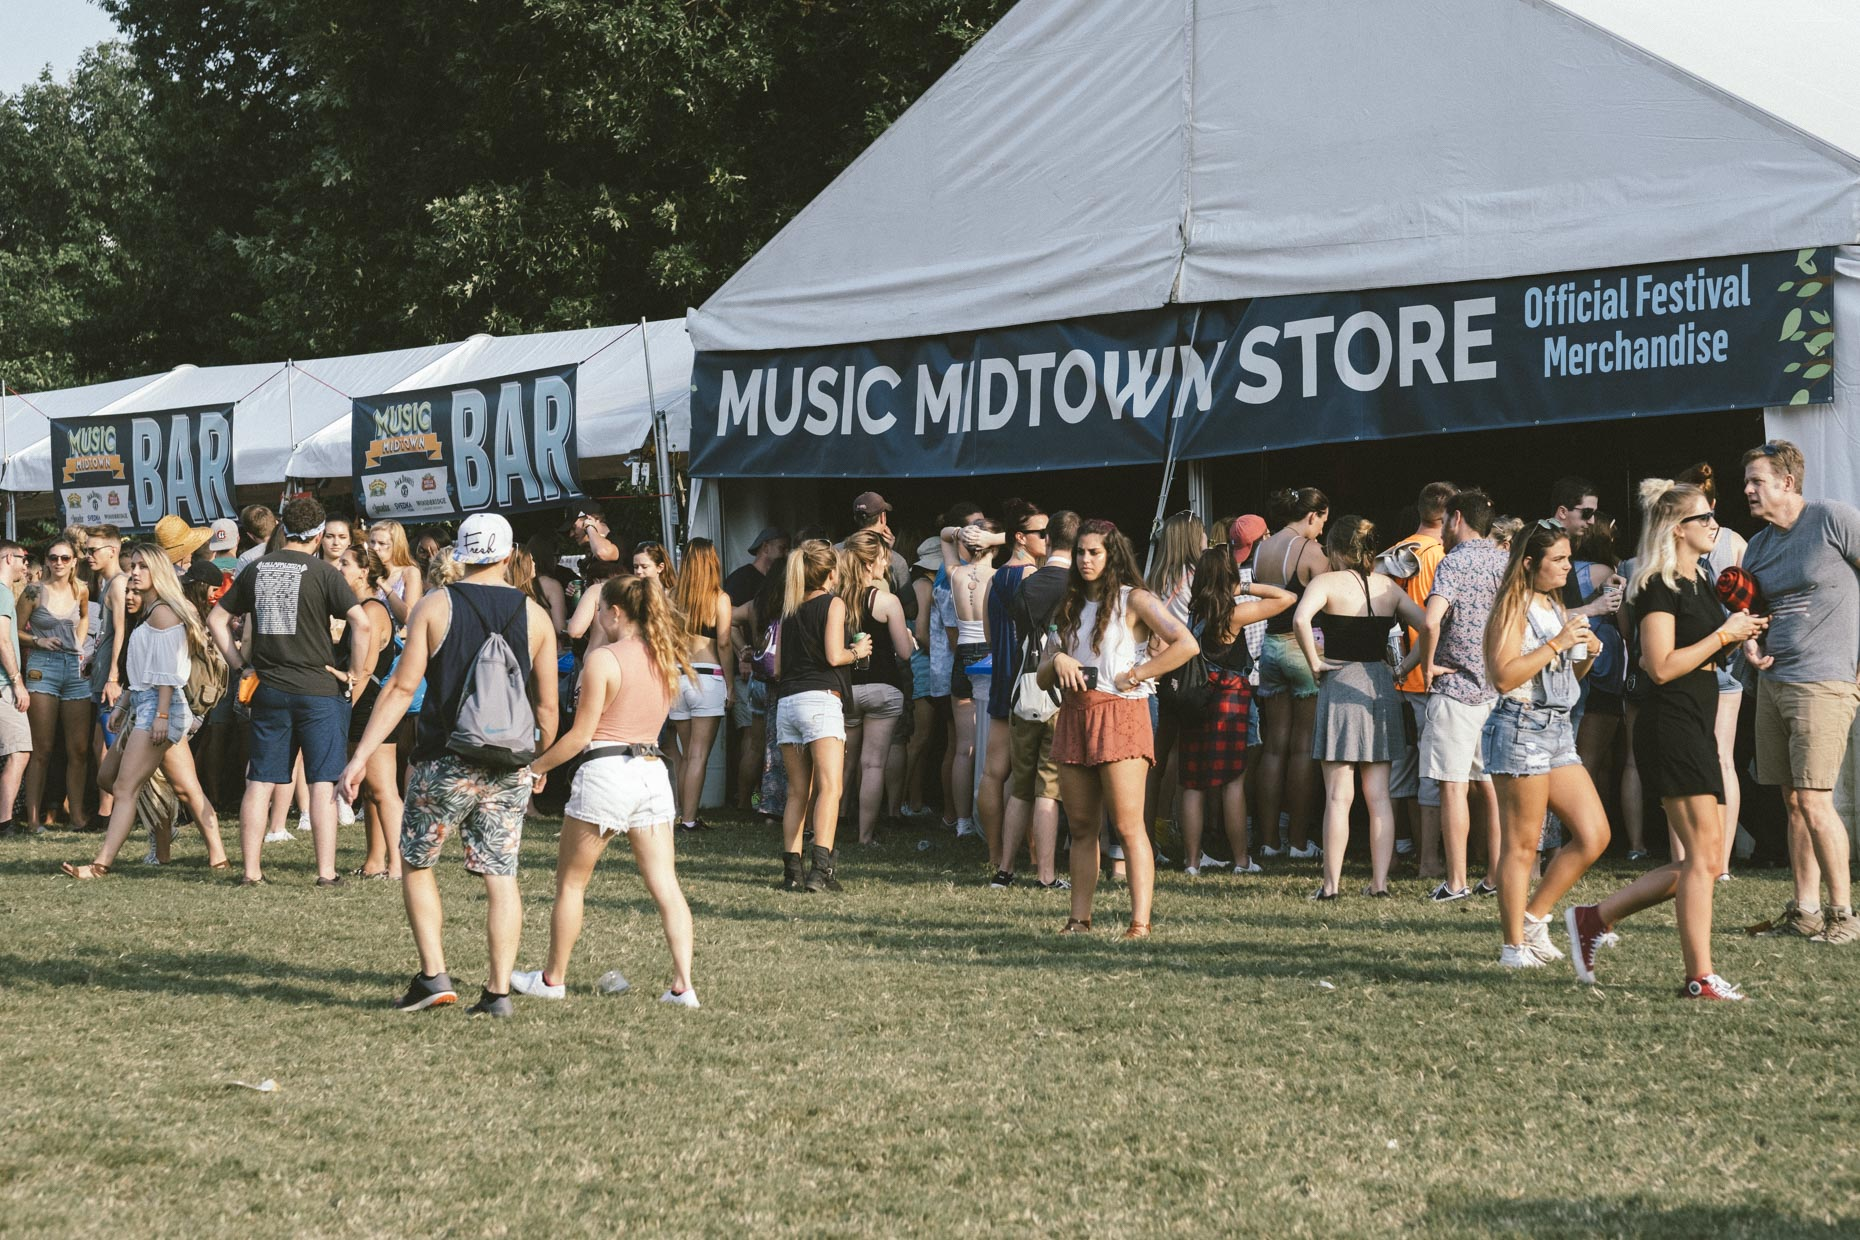 MusicMidtown-8.jpg